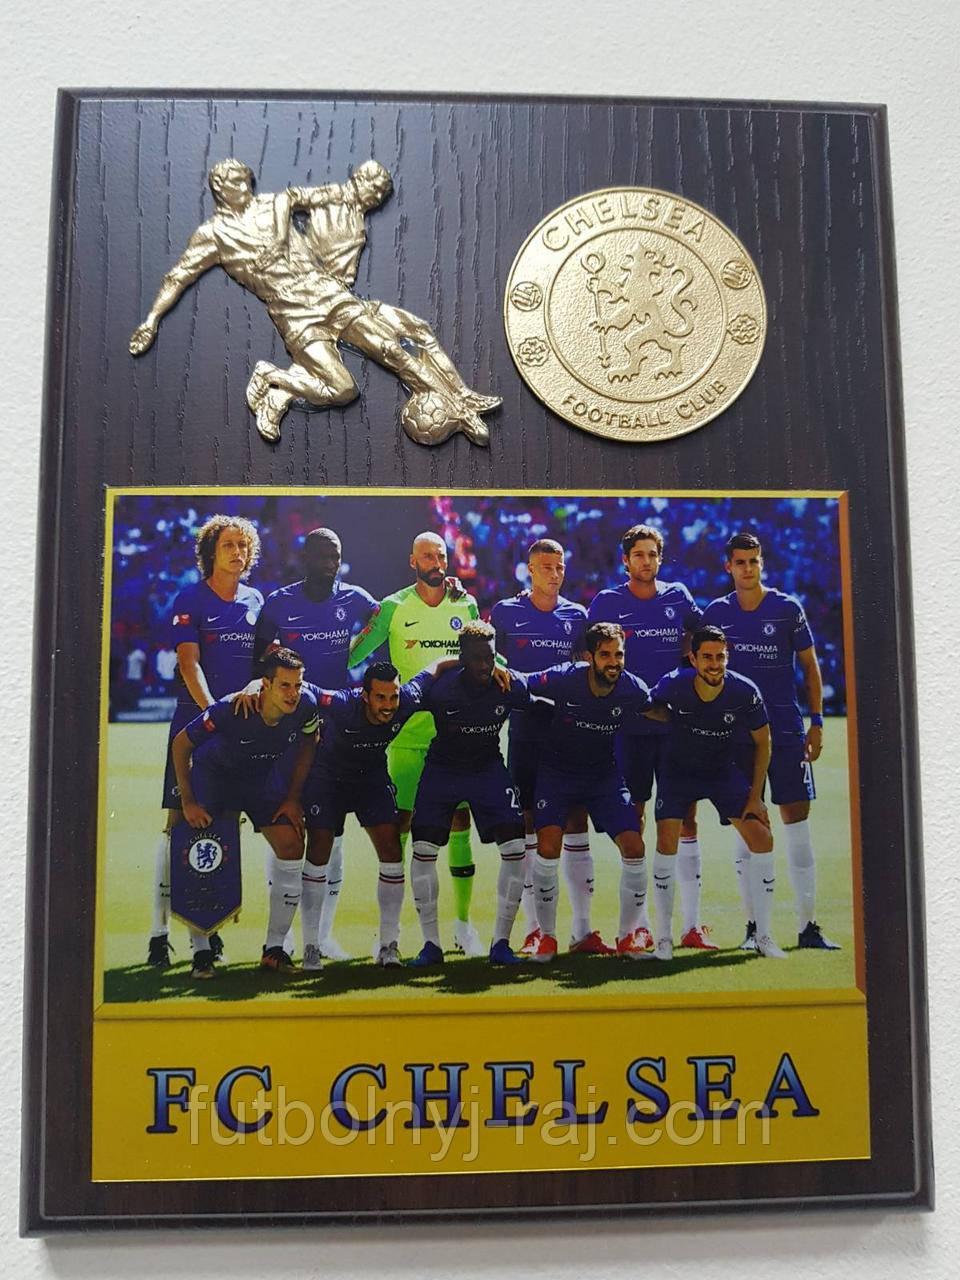 Плакетка Евроклубы FC Chelsea